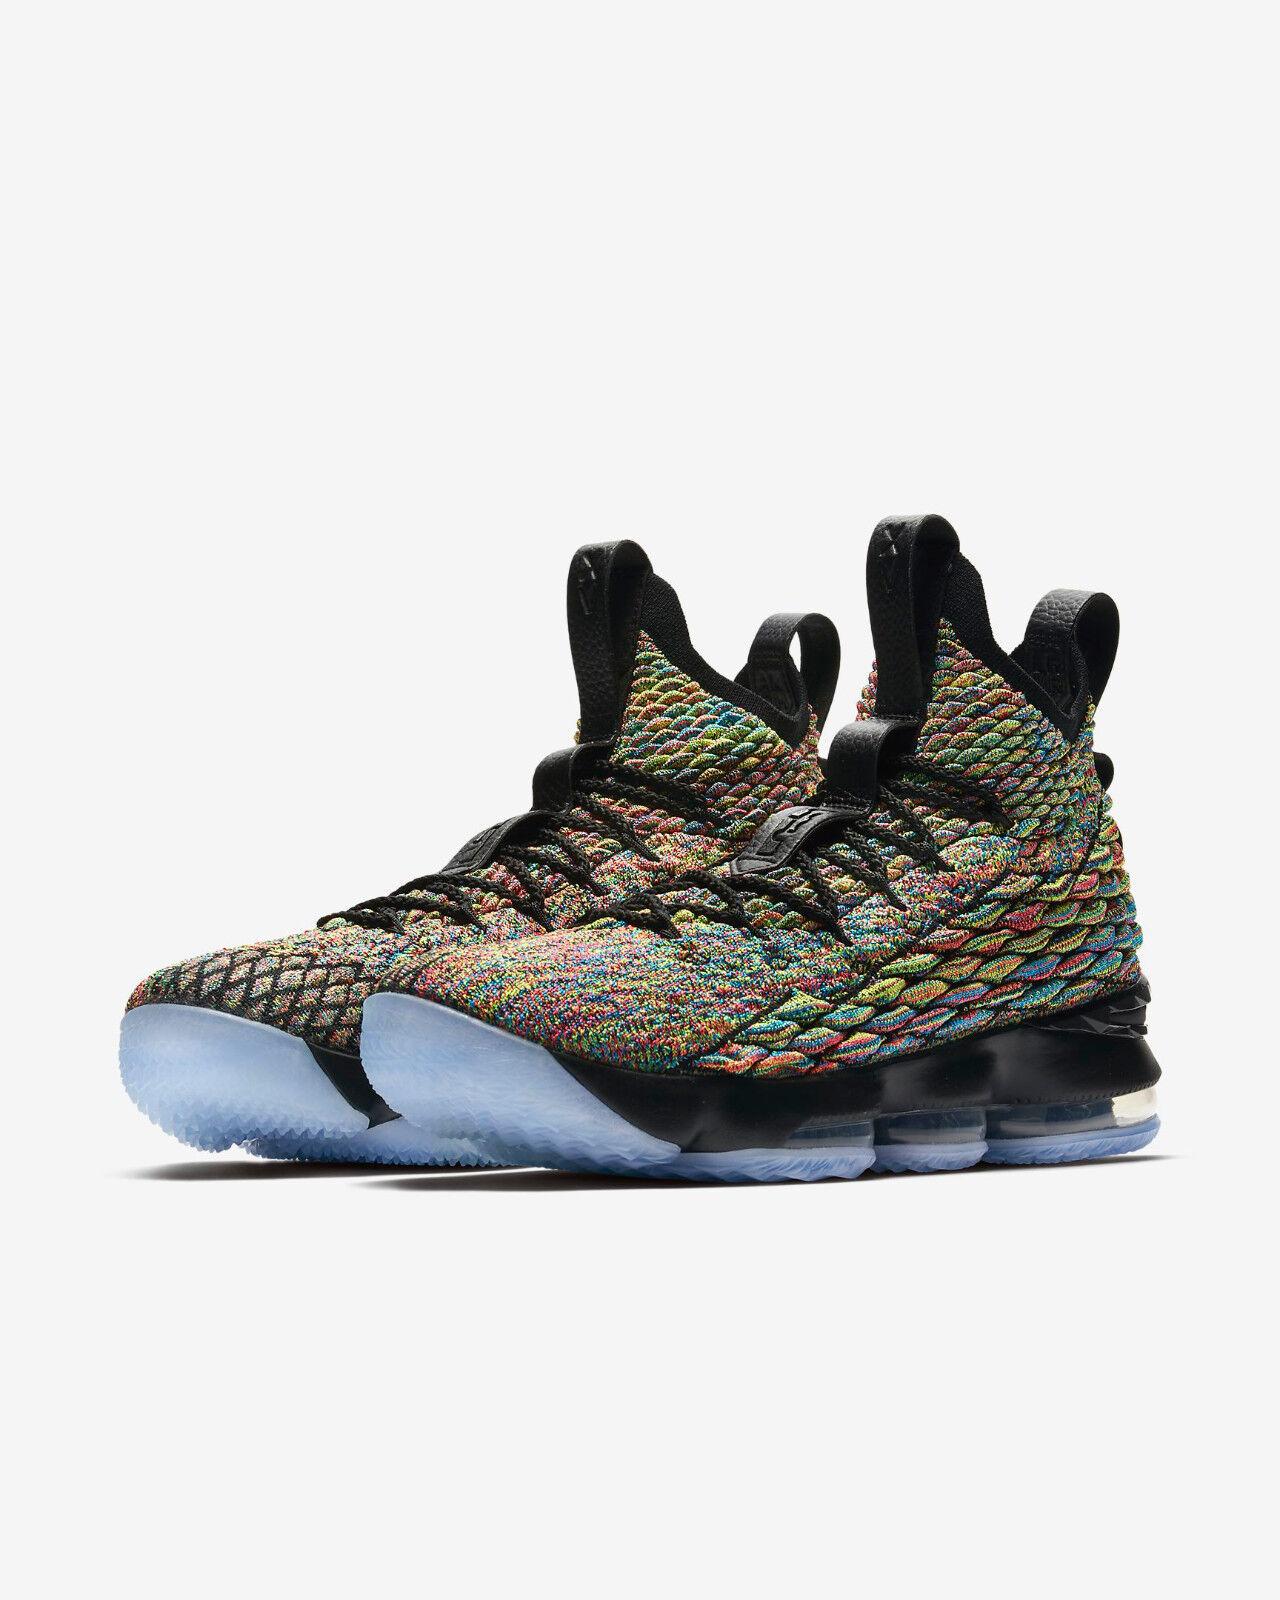 size 40 ed82a 8c60c Details about Nike LeBron James 15 XV Multi-color Black - Men s Size 10 -  Brand New w Box